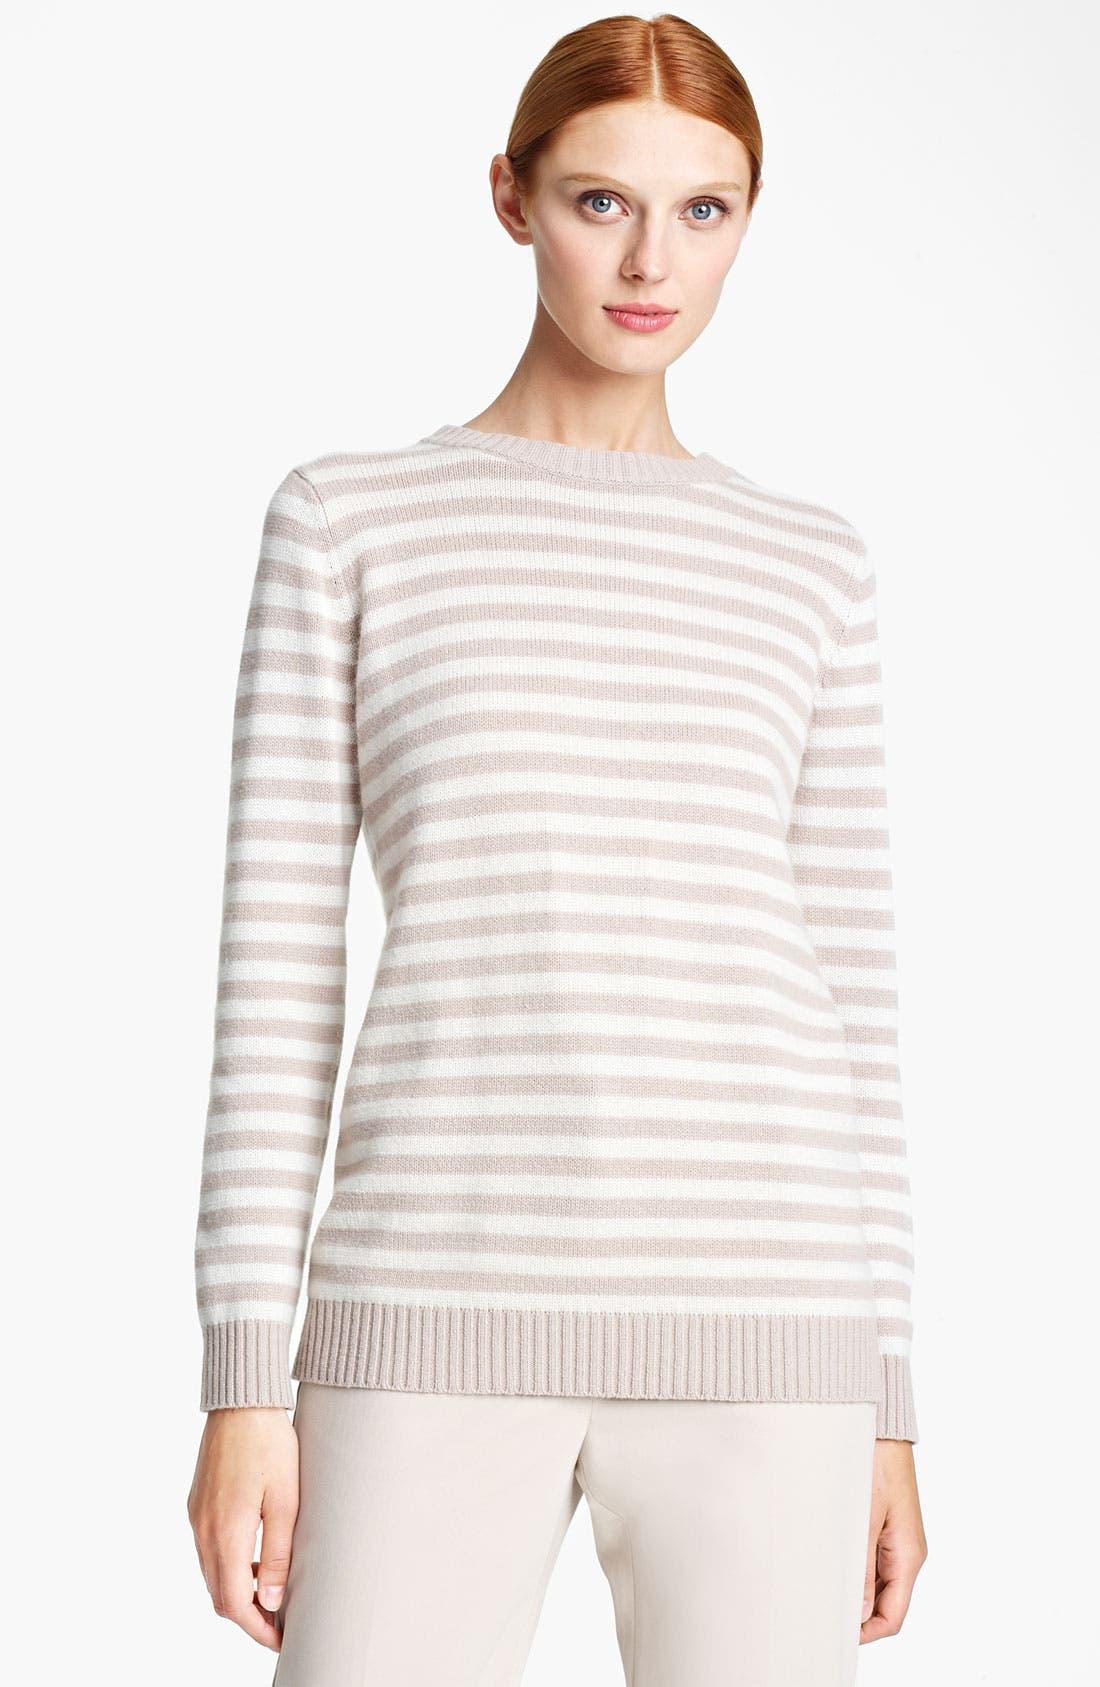 Alternate Image 1 Selected - Max Mara 'Auronzo' Striped Cashmere & Cotton Sweater